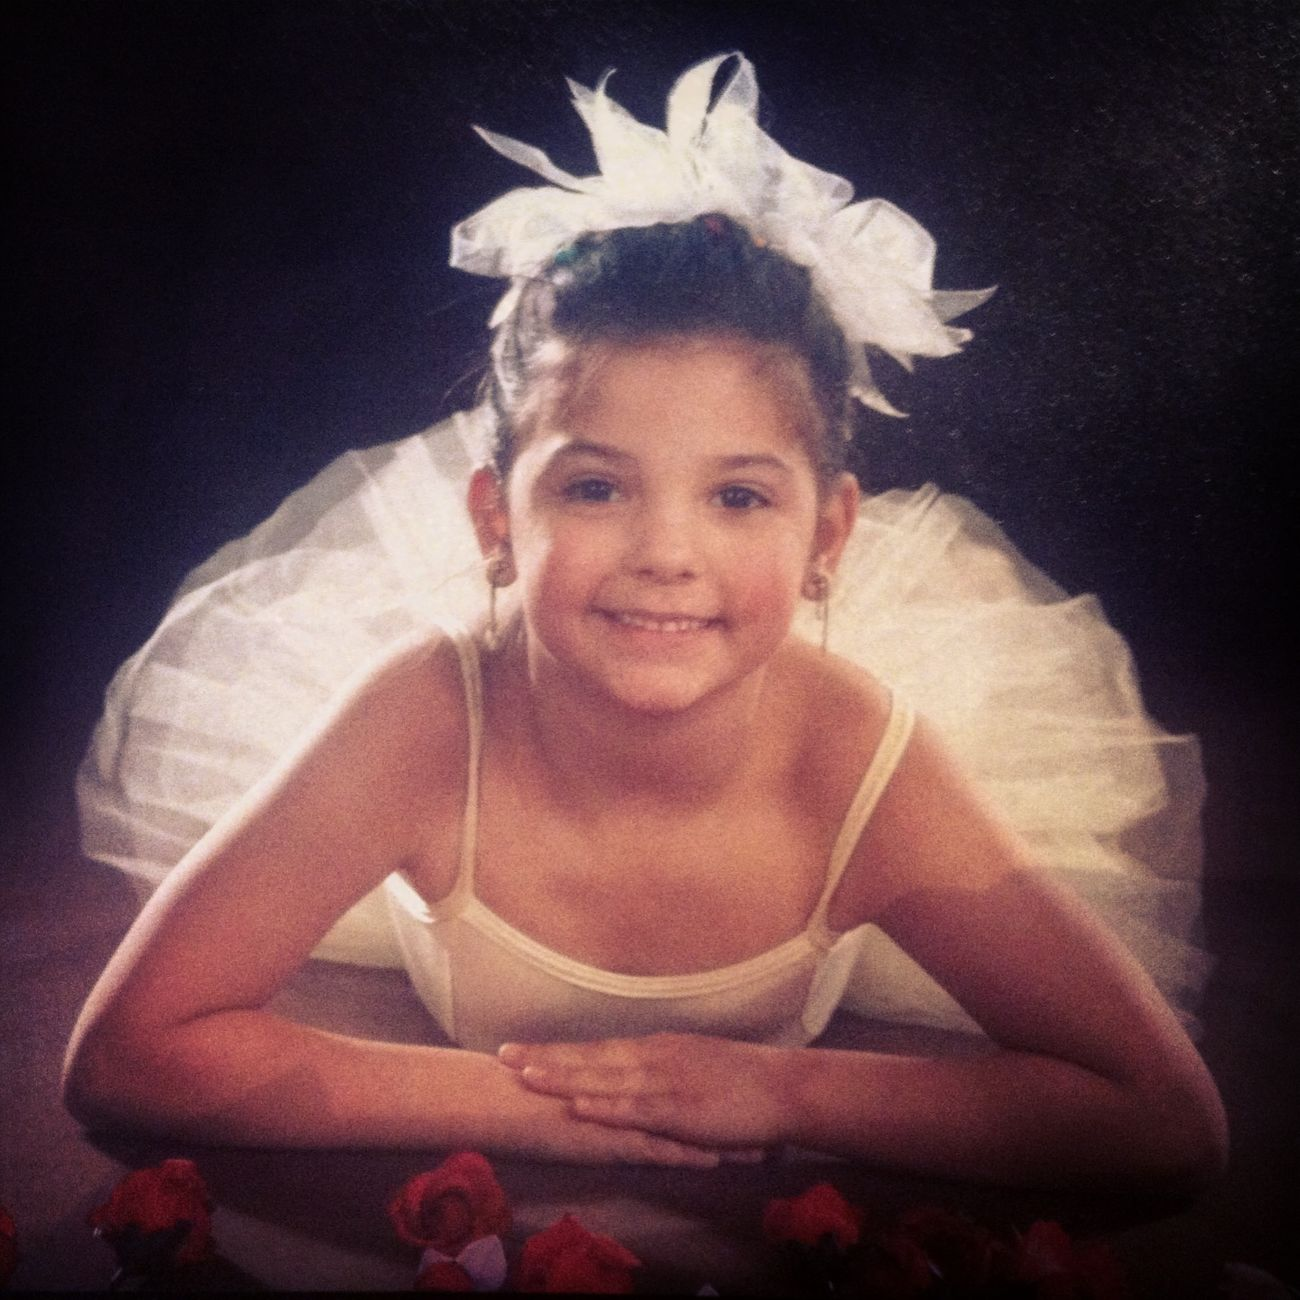 Childhood Prettyballerine Years Ago Me